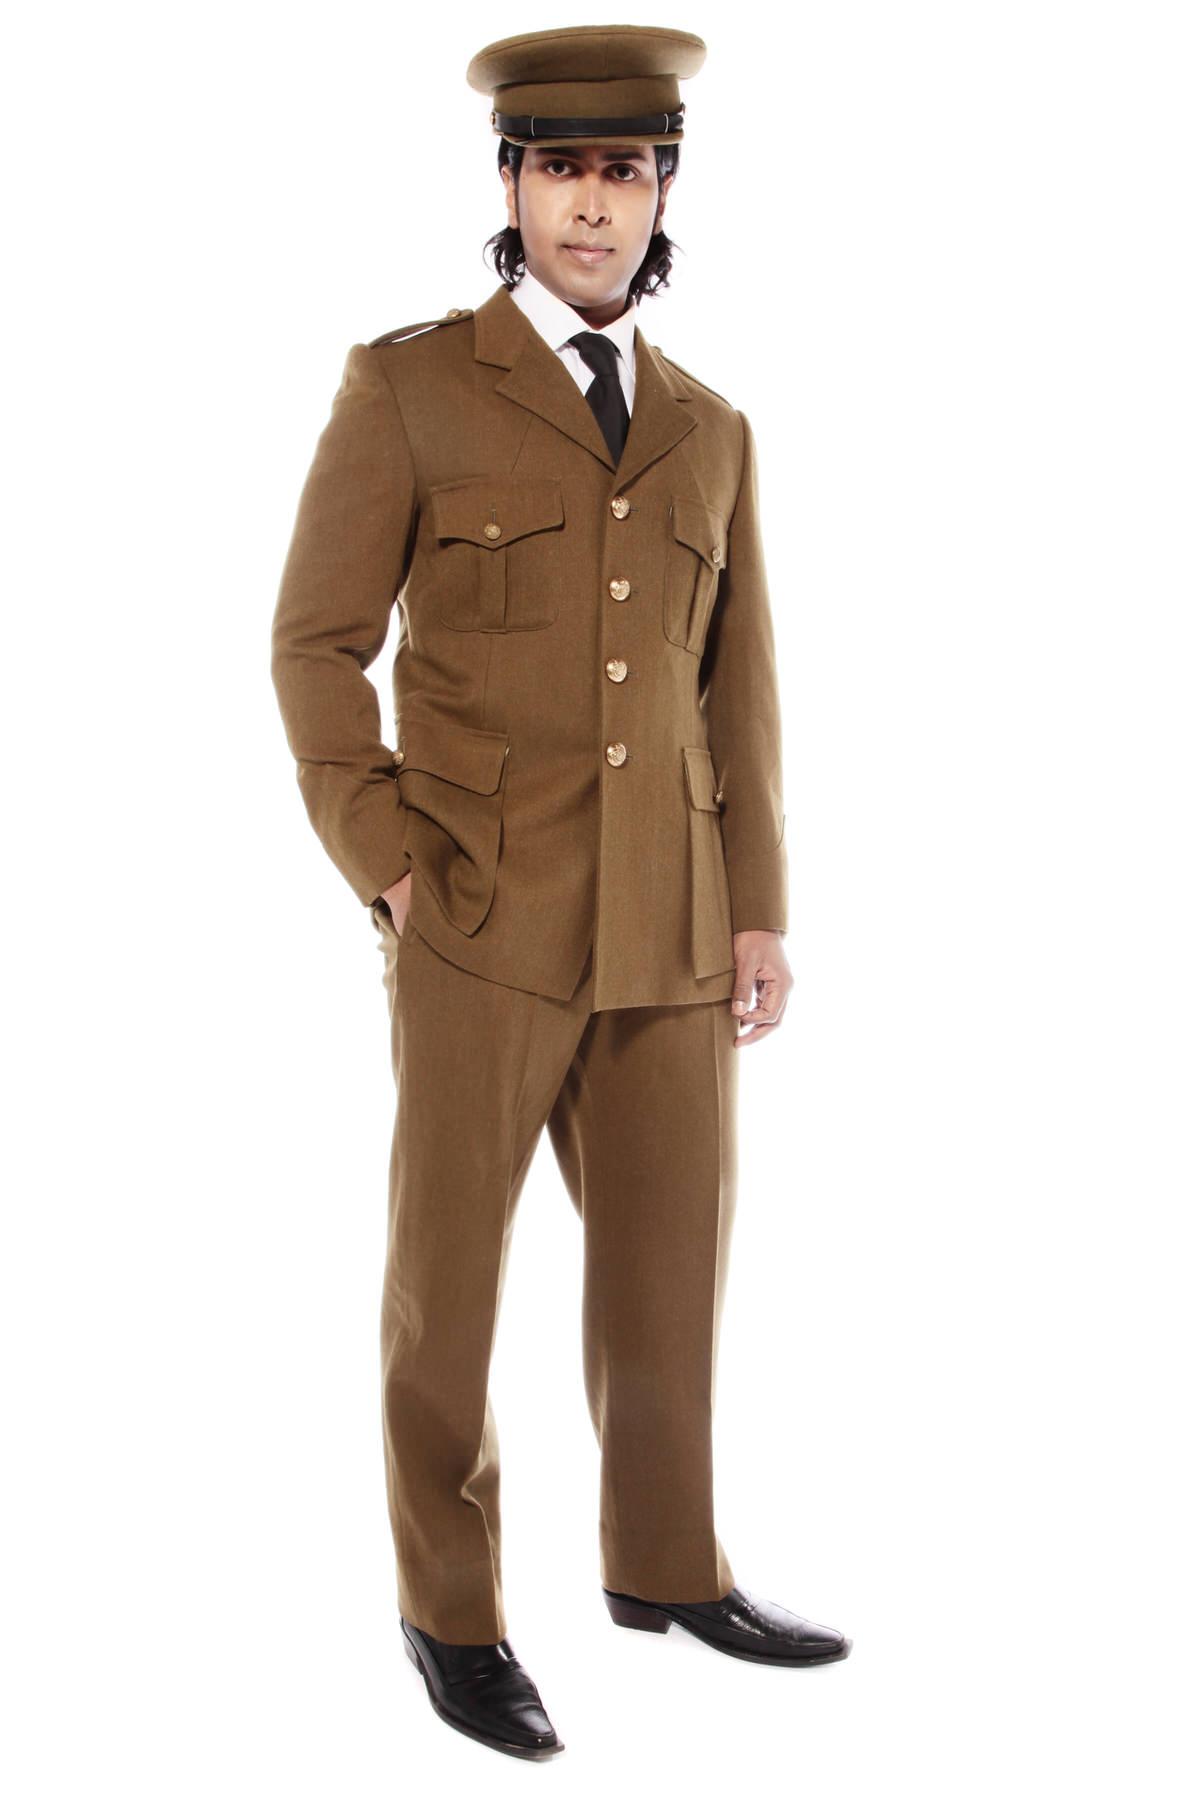 WW11 BRITISH ARMY OFFICER COSTUME W MATCHING CAP